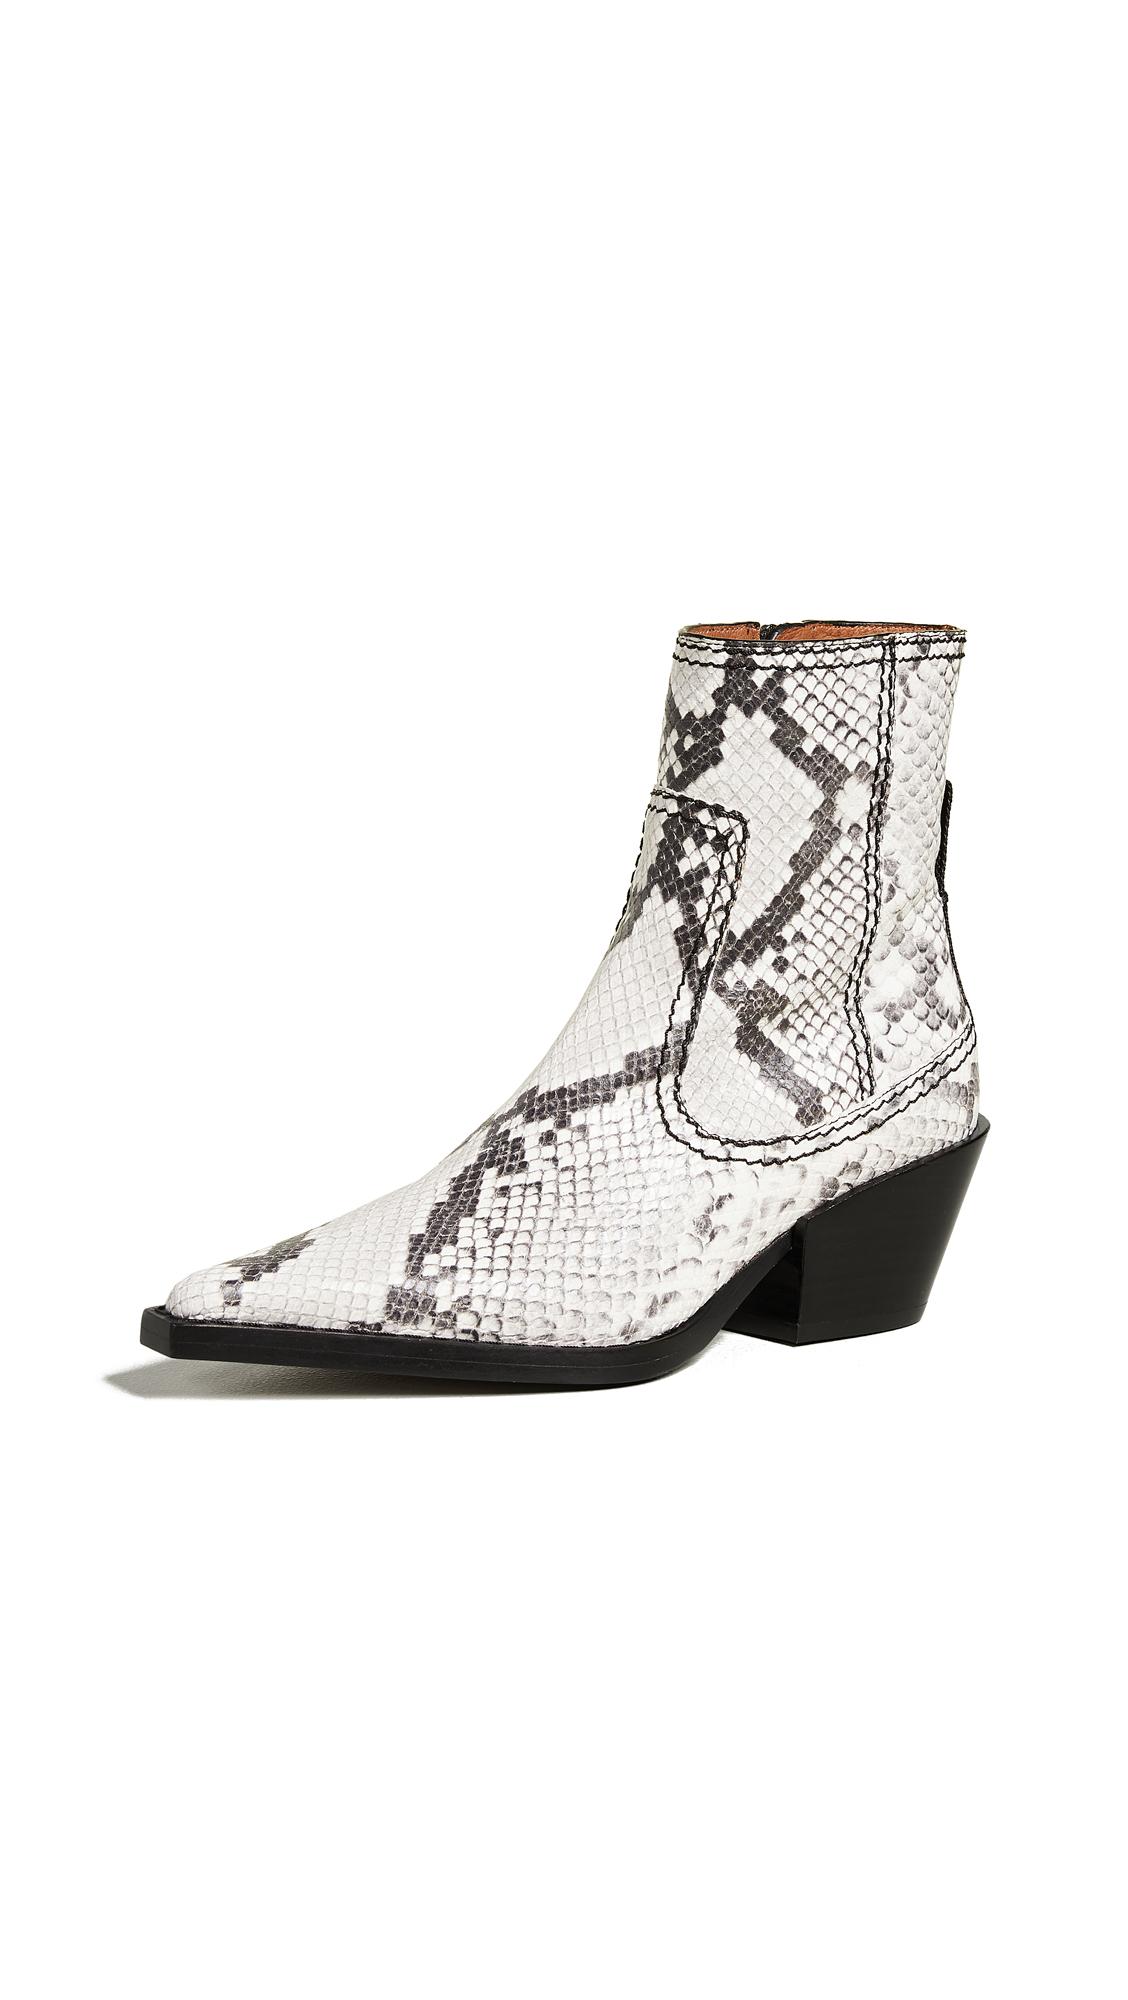 Joseph Rodeo Ankle Boots - Roccia